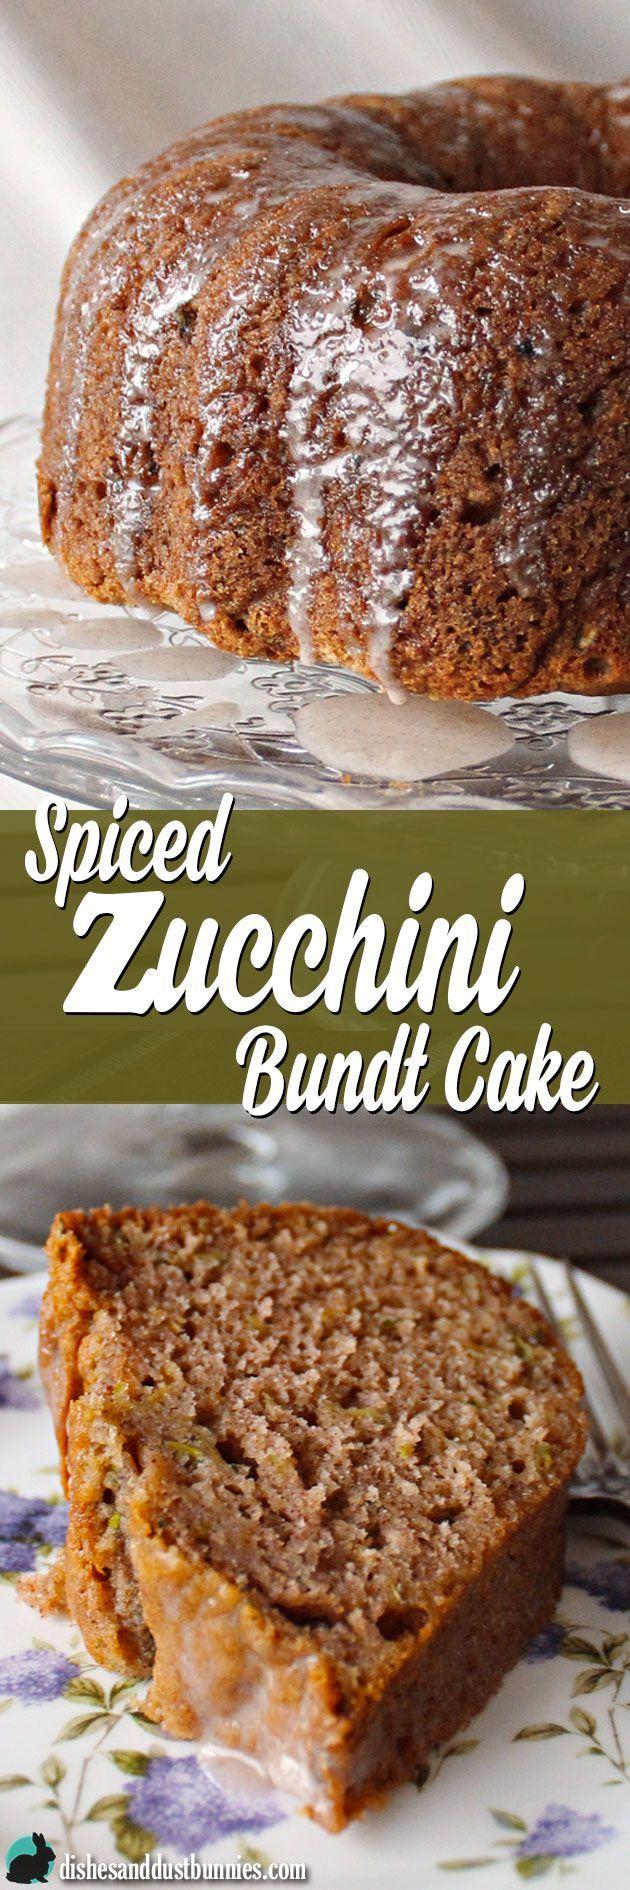 Spiced Zucchini Bundt Cake from dishesanddustbunnies.com